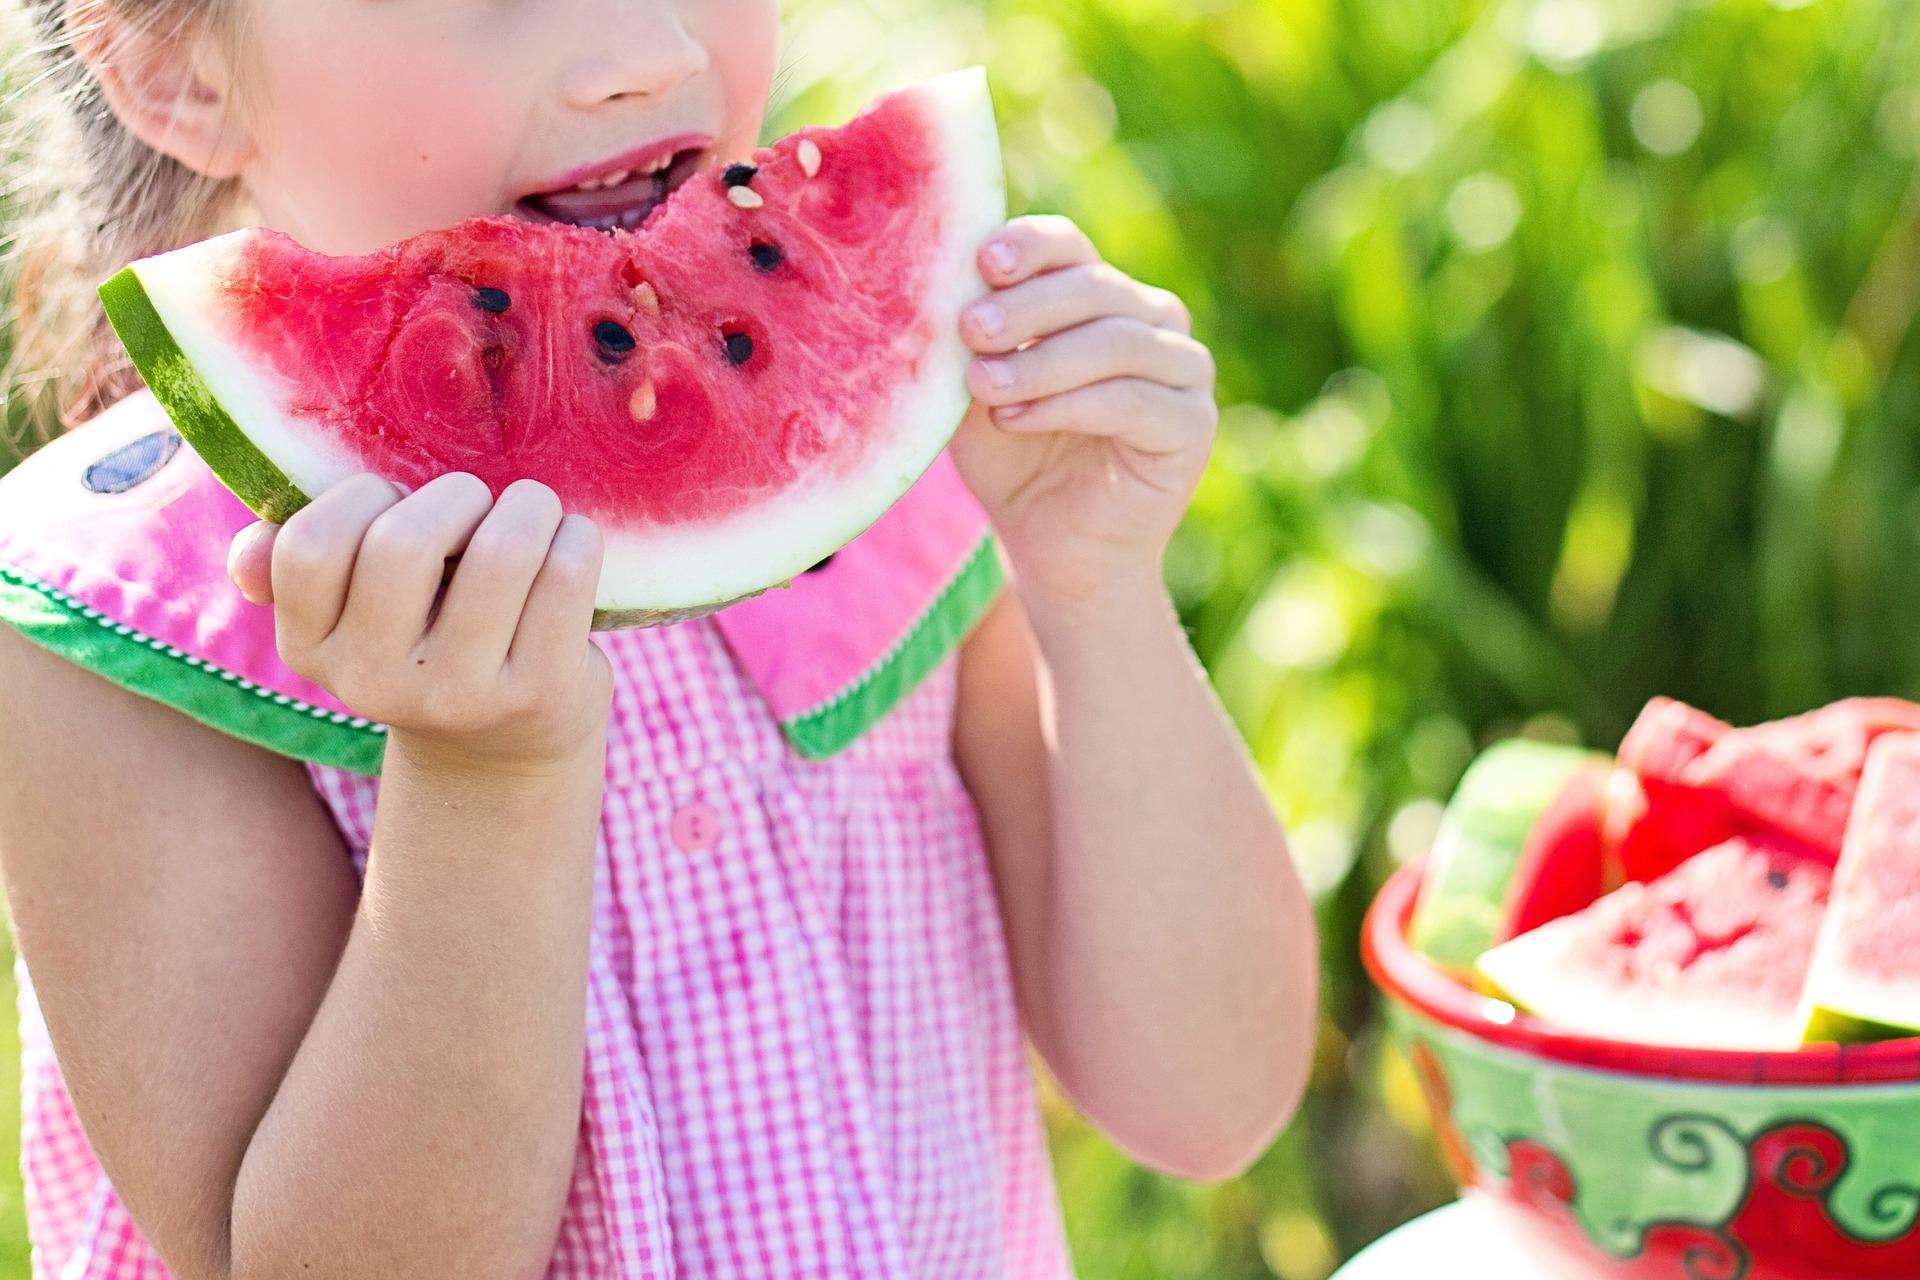 a kid eating watermelon